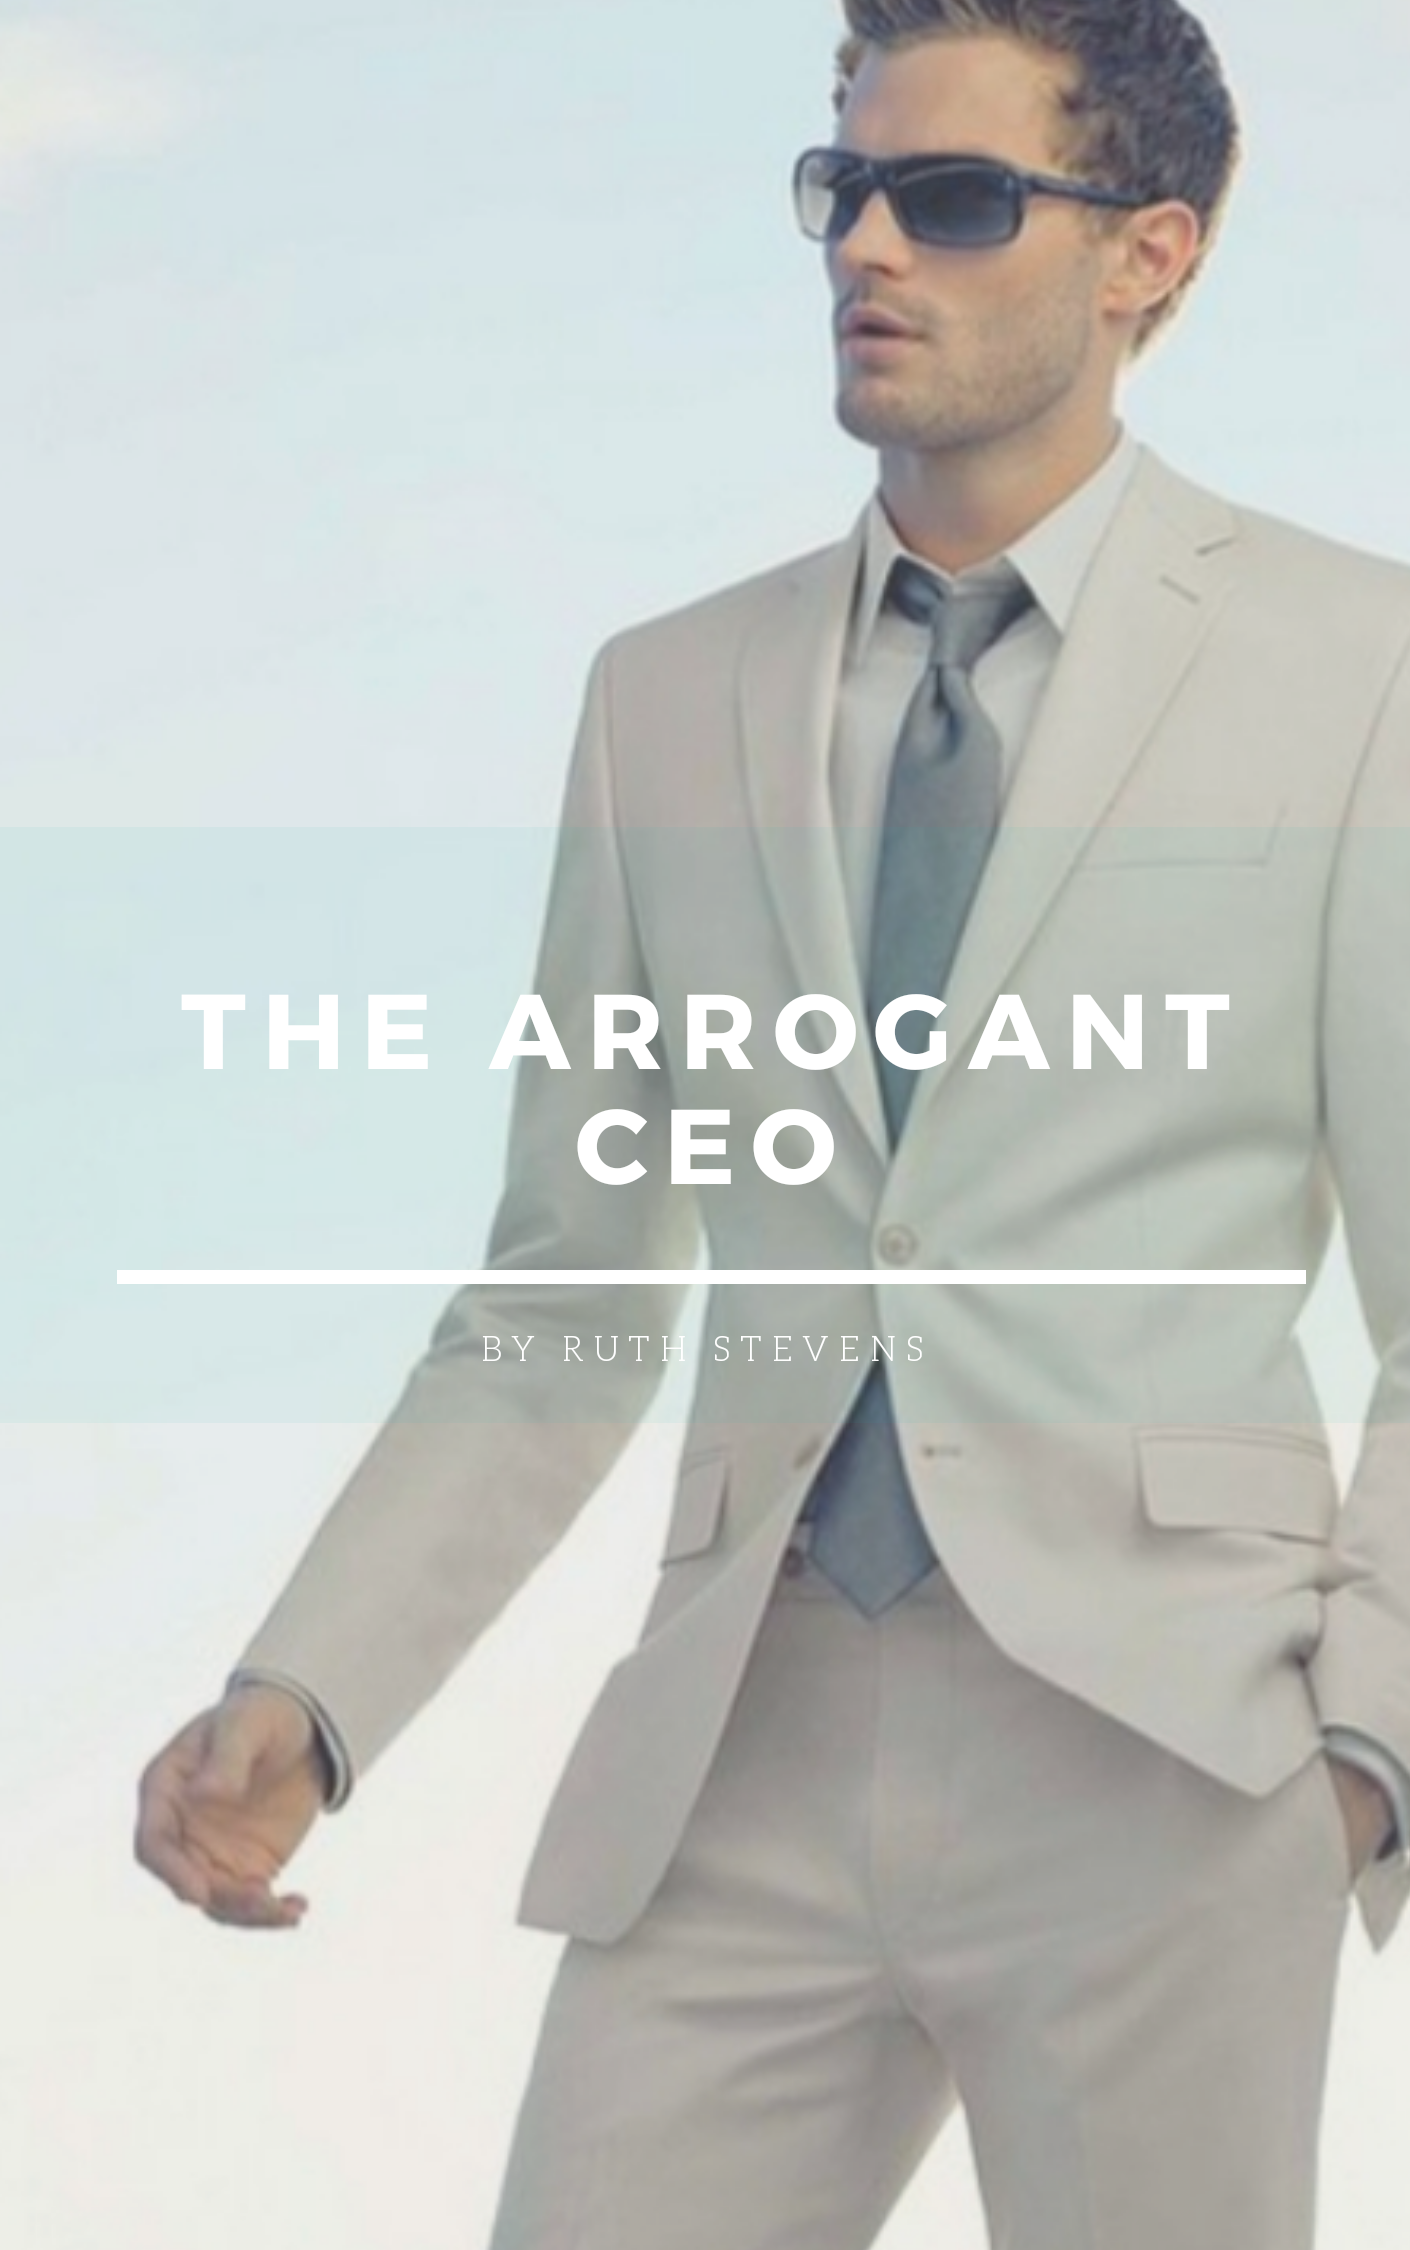 The Arrogant CEO